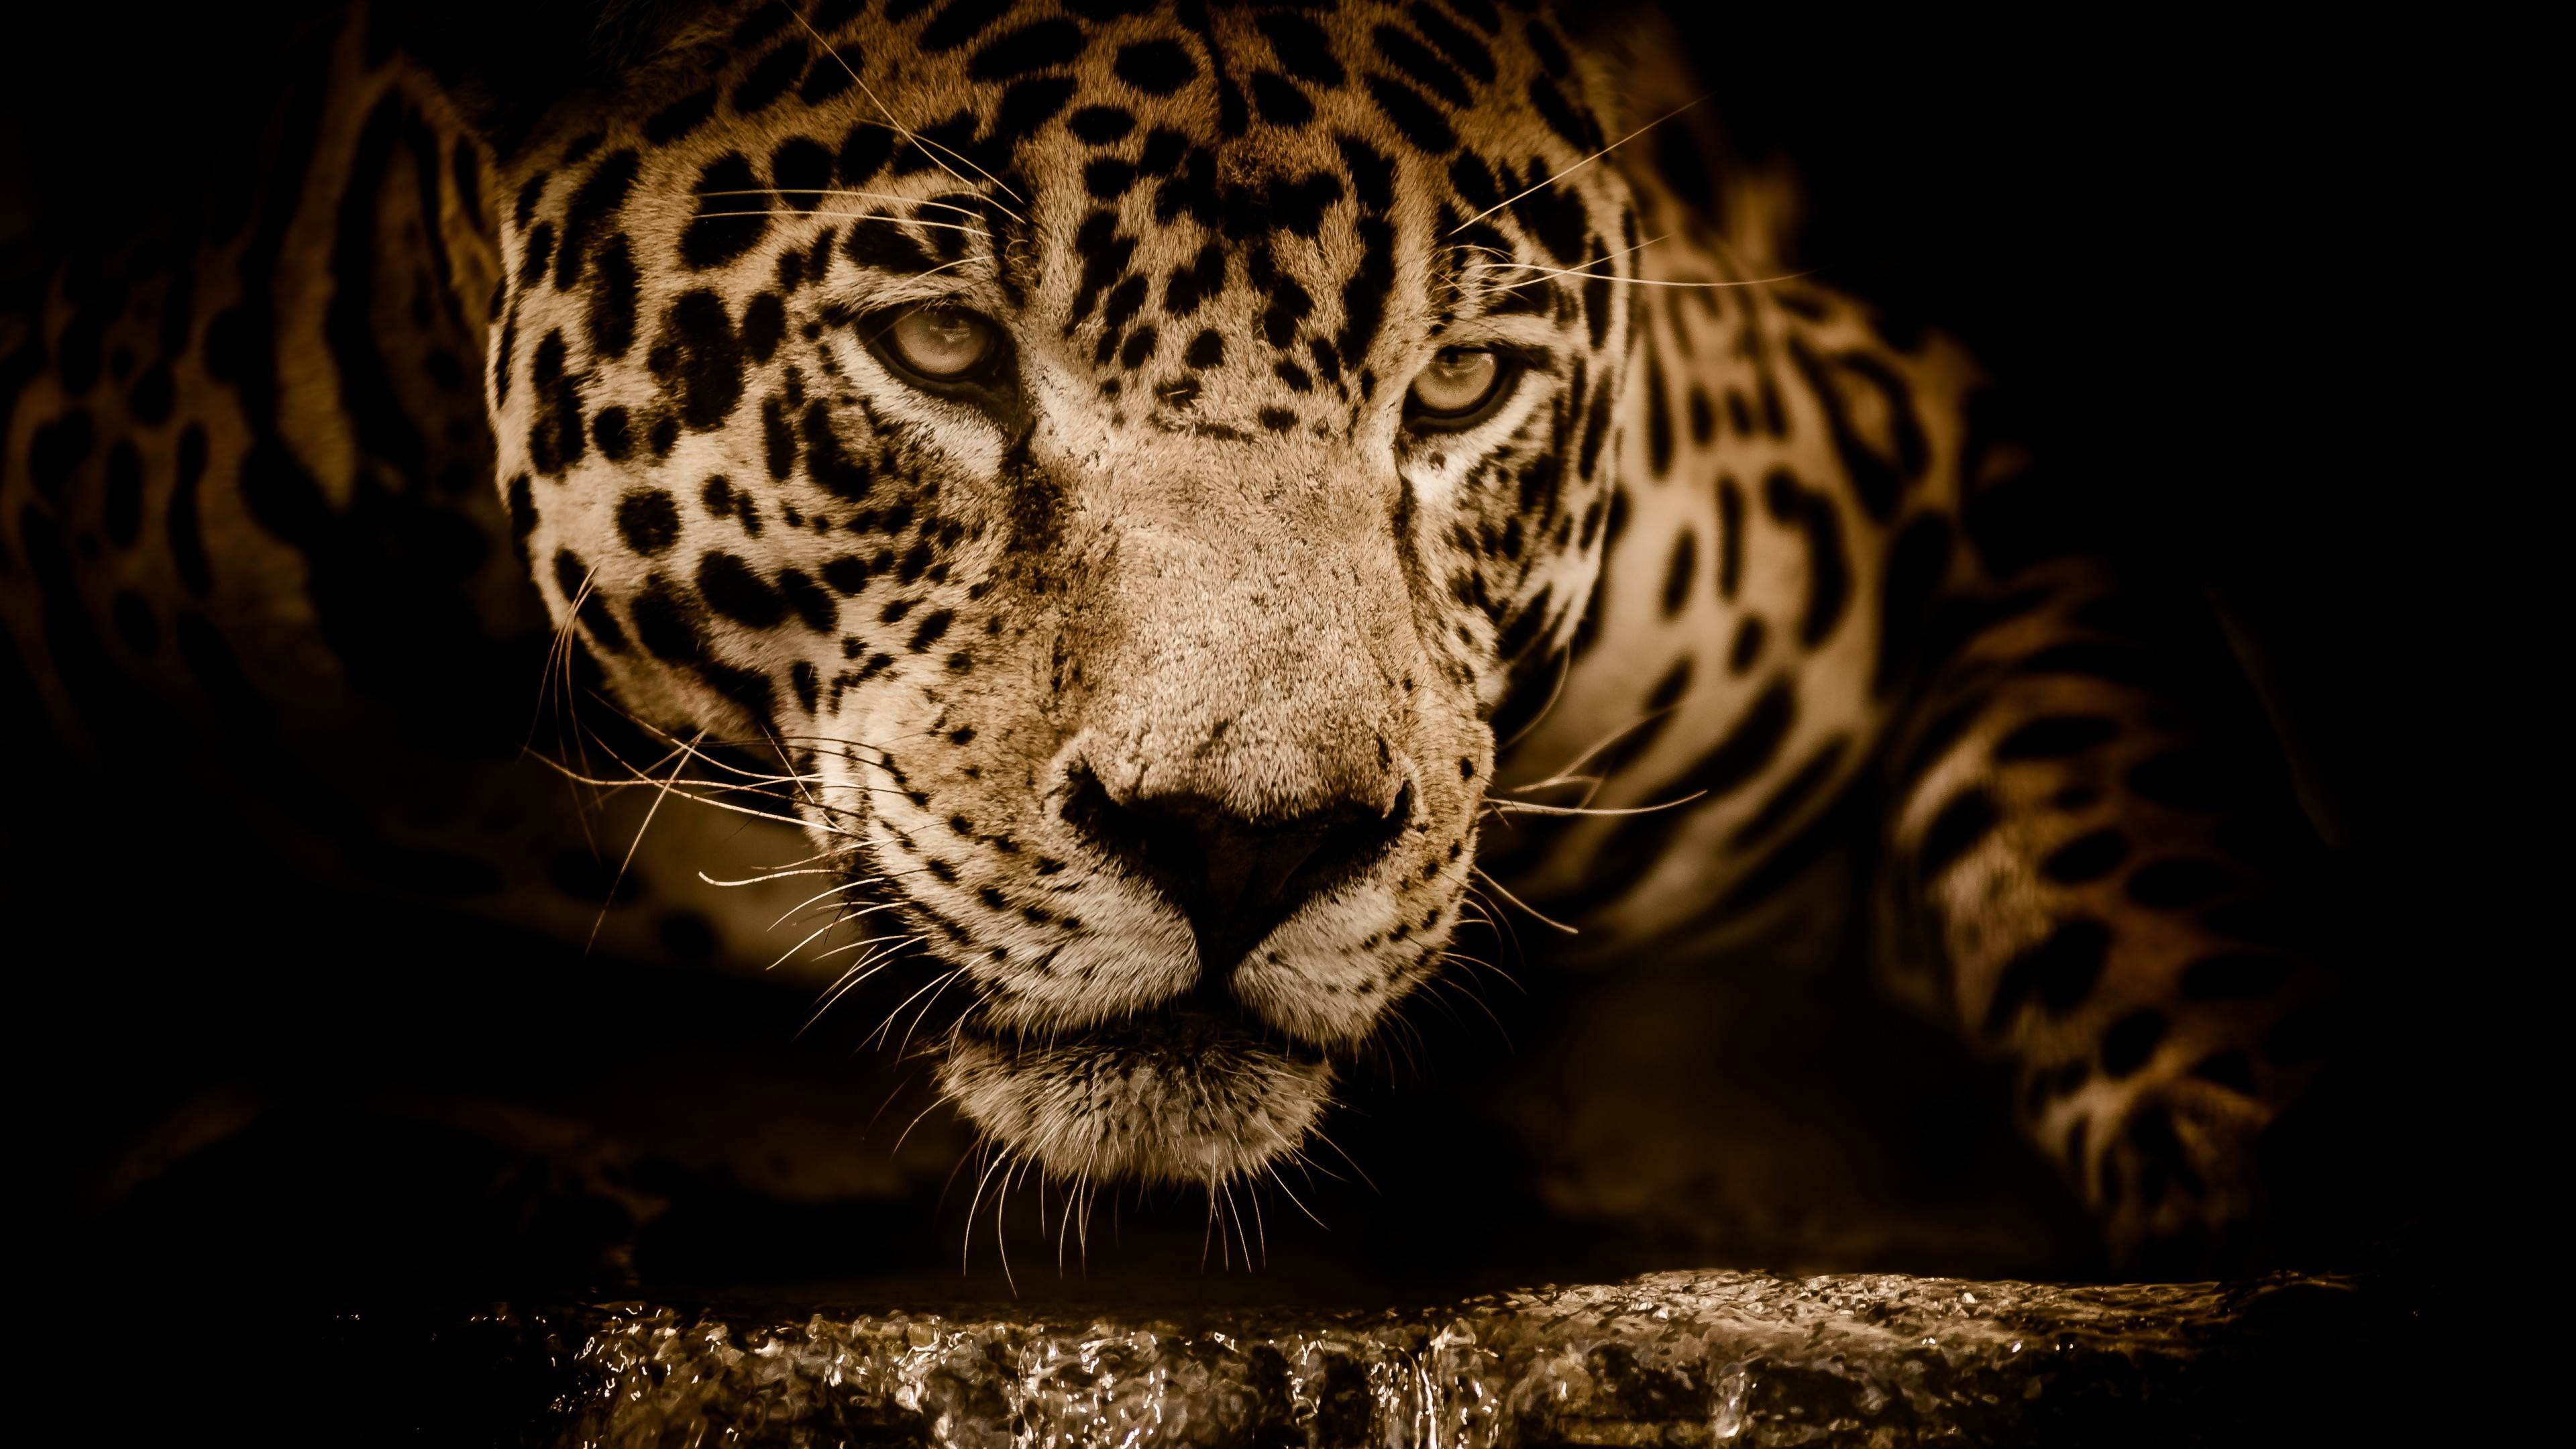 Amazing Jaguar Wallpaper